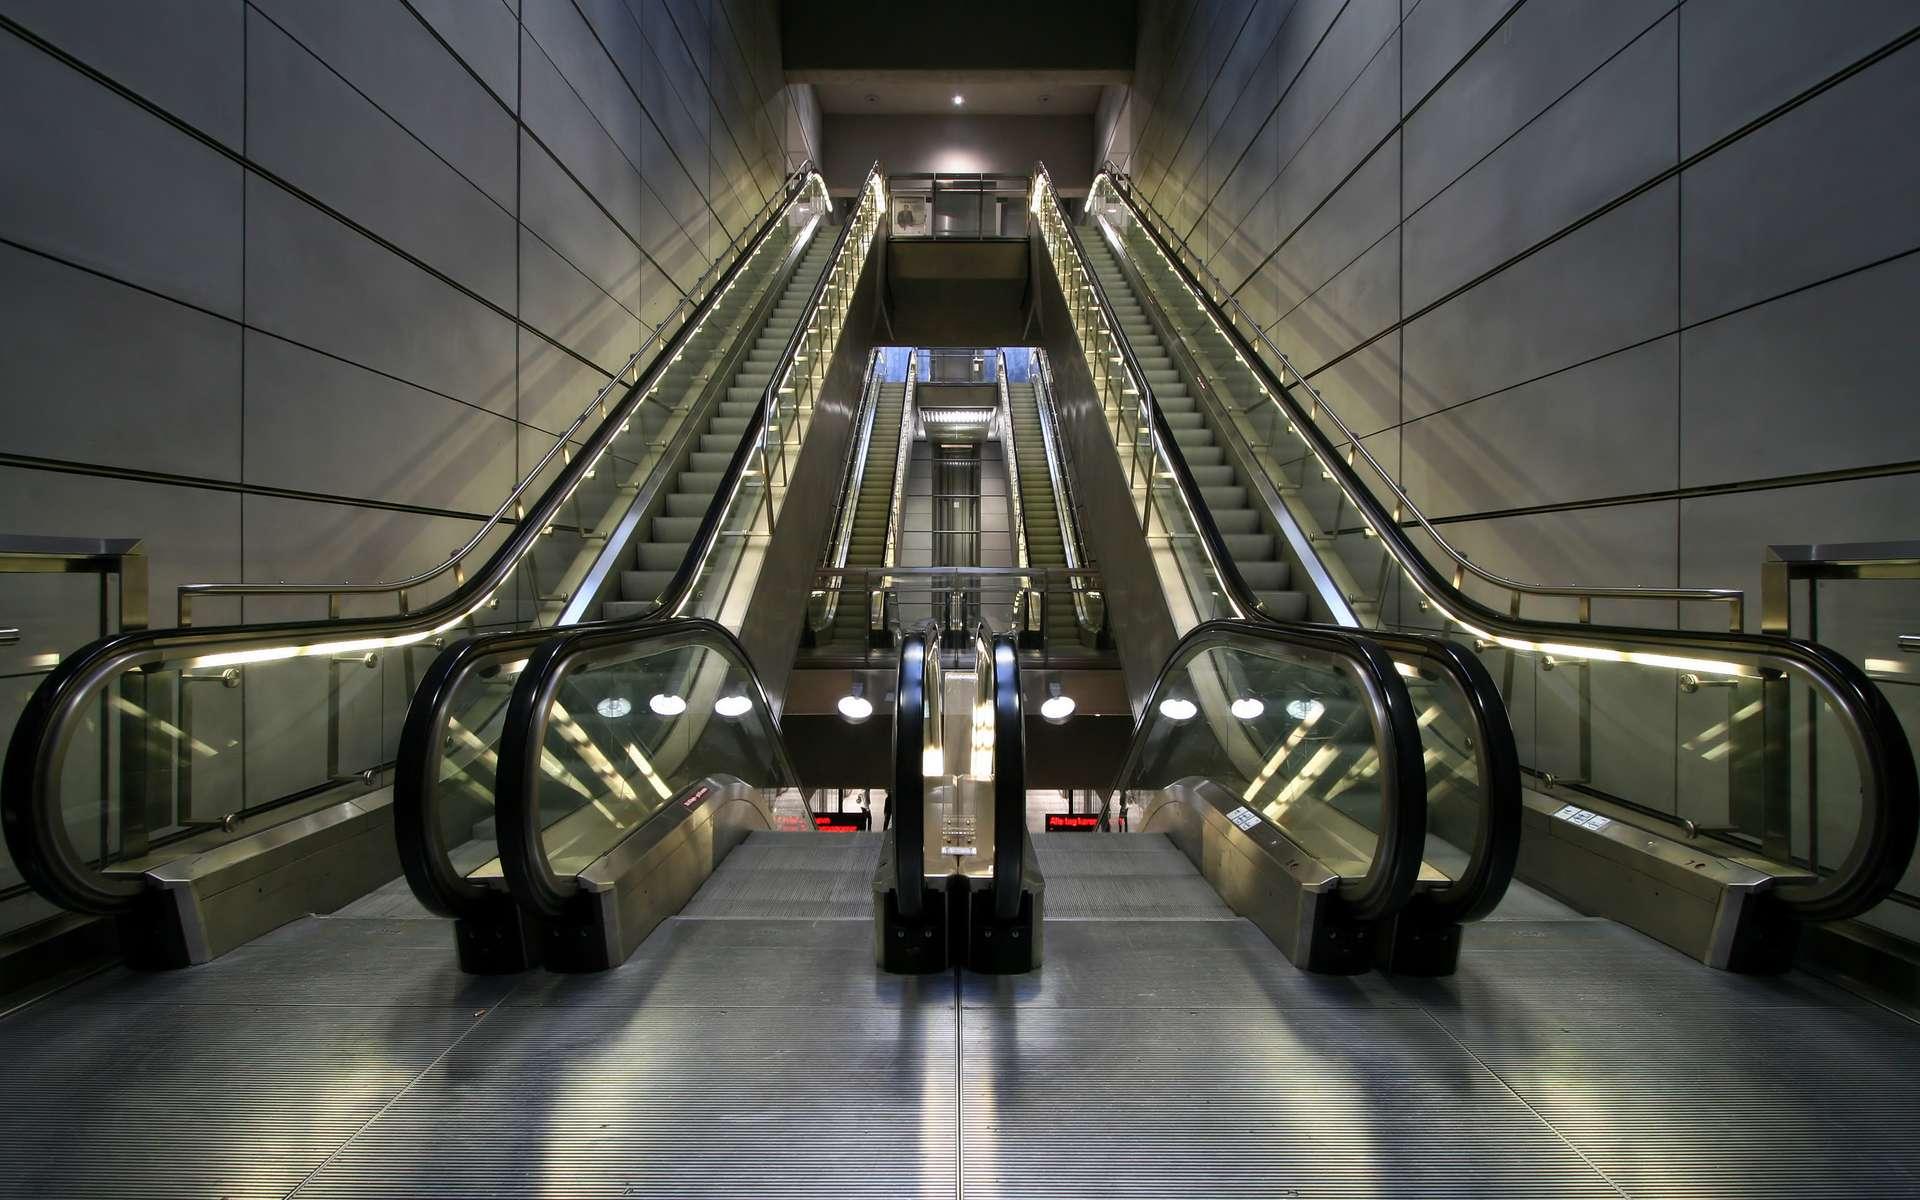 Jesse W Reno invente le concept d'escalier mécanique. © Stig Nygaard, CC BY 2.0, Wikimedia Commons